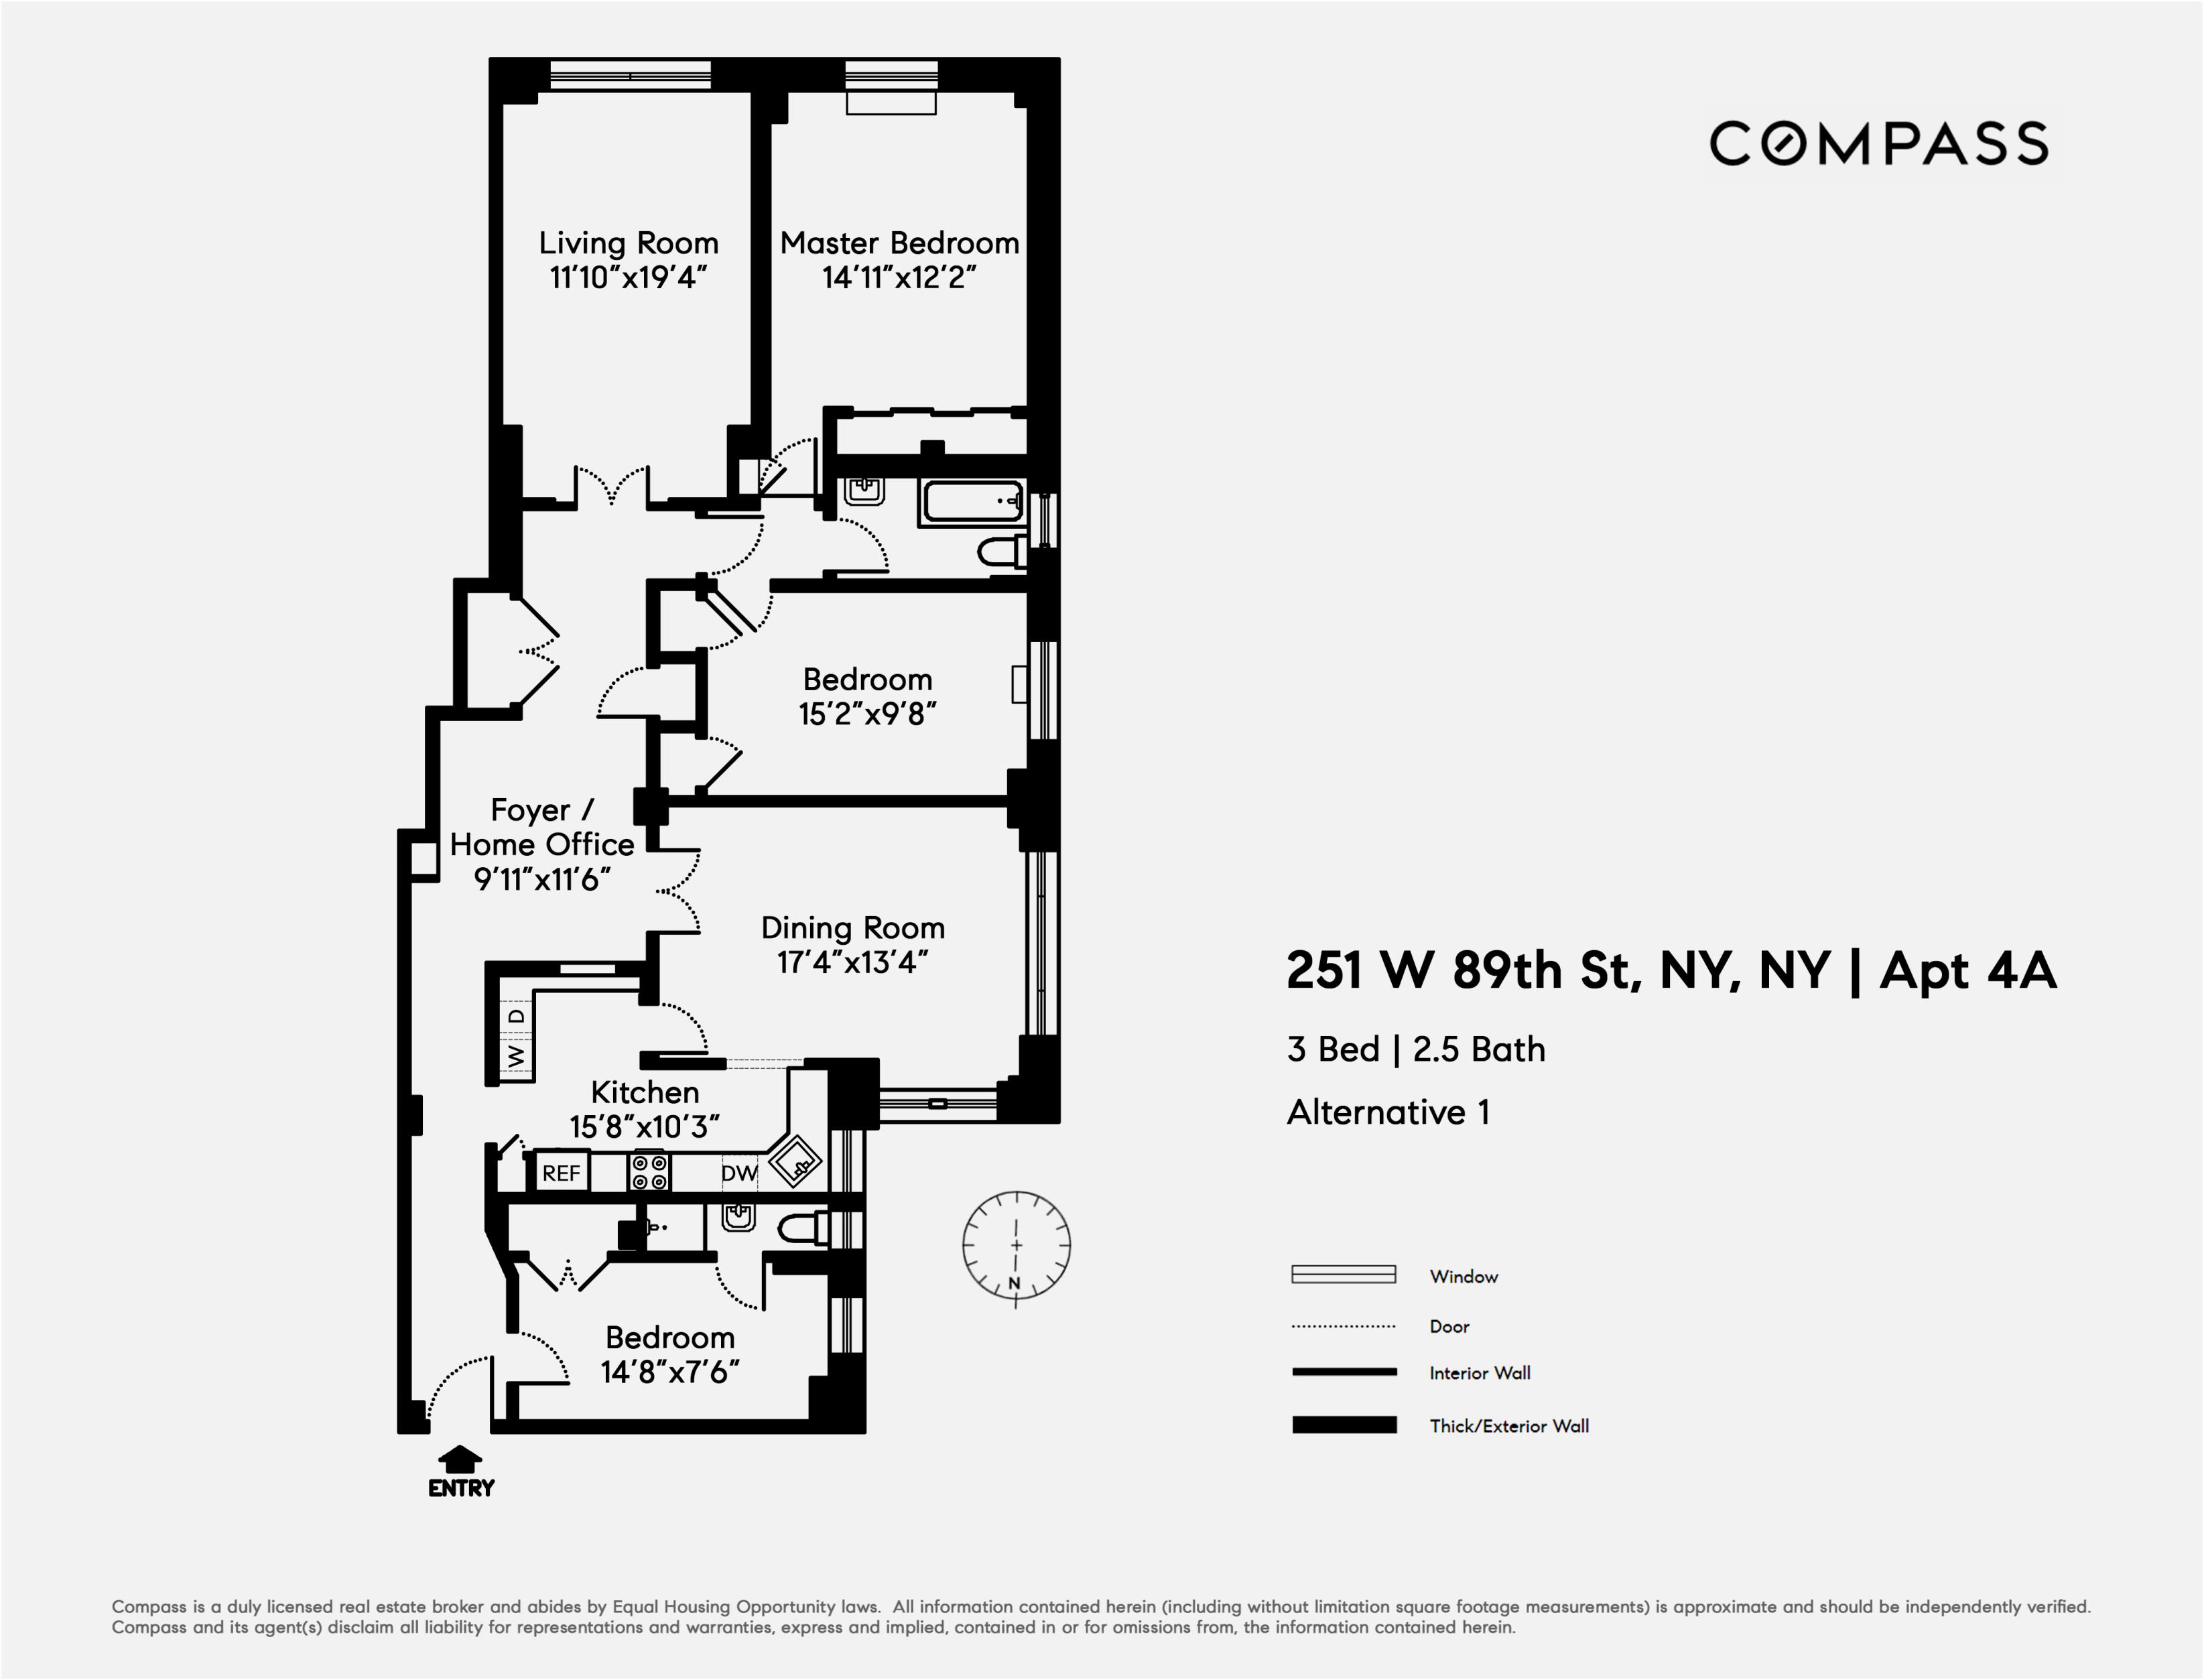 Richard Geiringer Real Estate Agent In New York City Compass 360 Degree Diagram